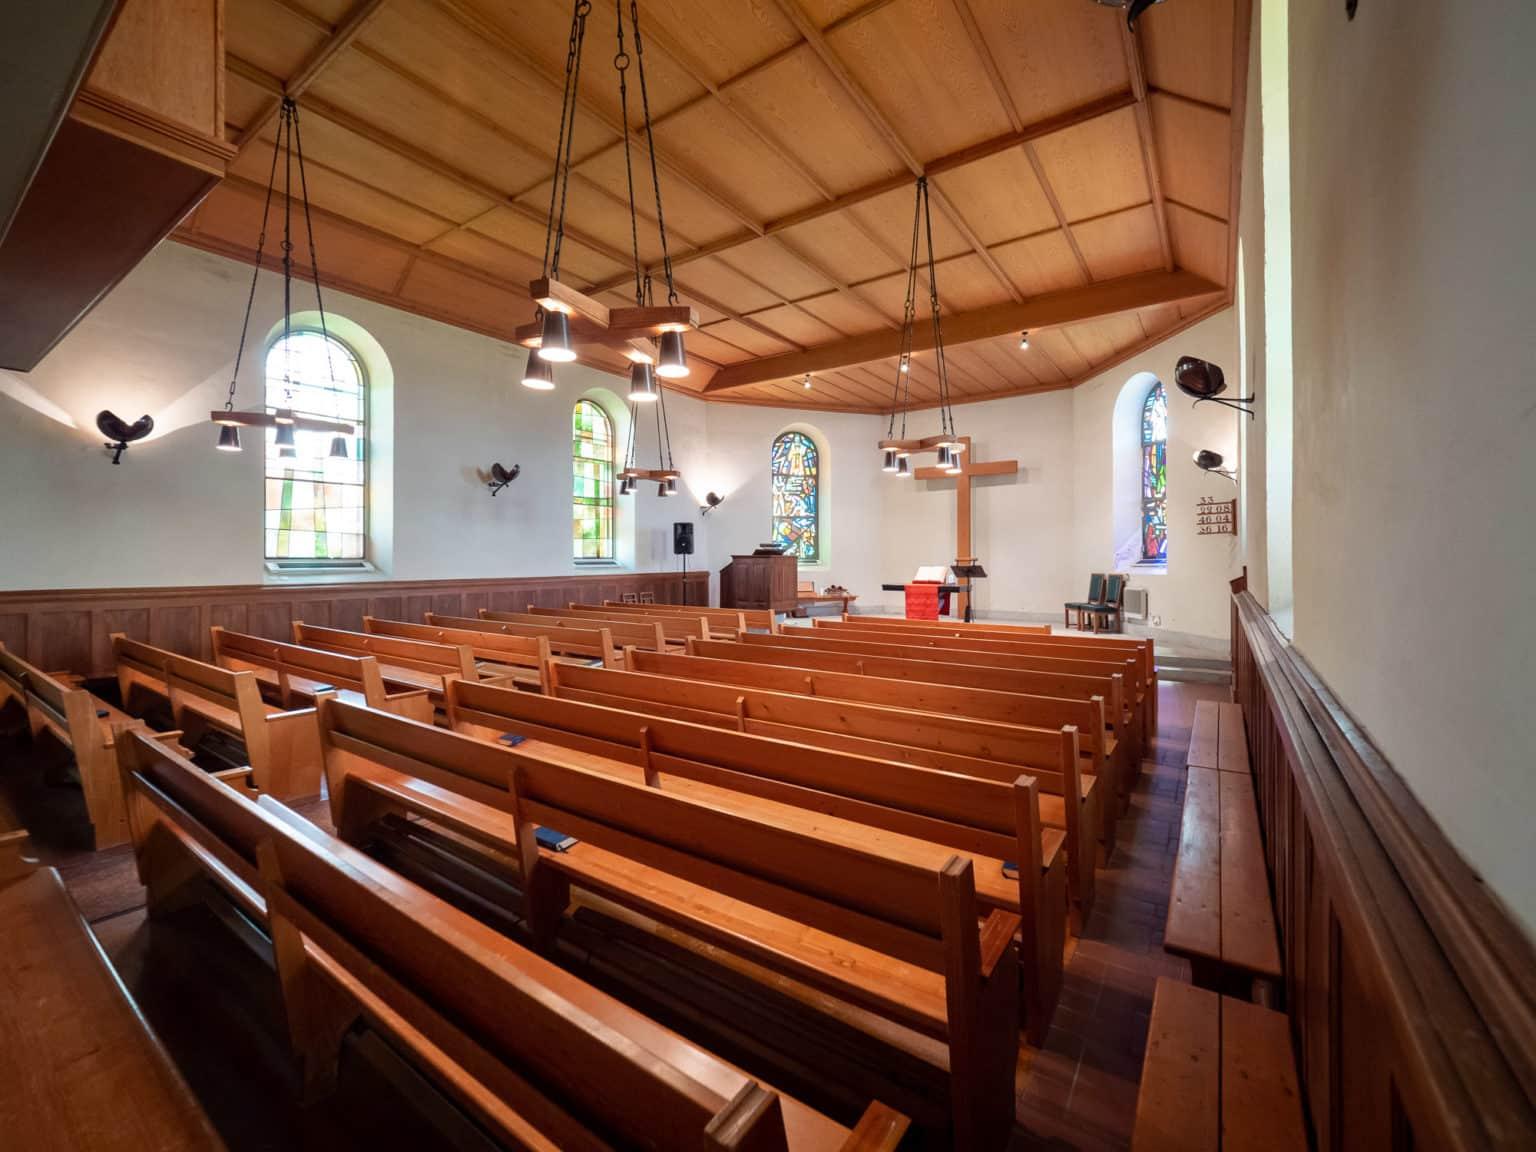 Refuges-salles-Montanaire©V-Dubach-52595